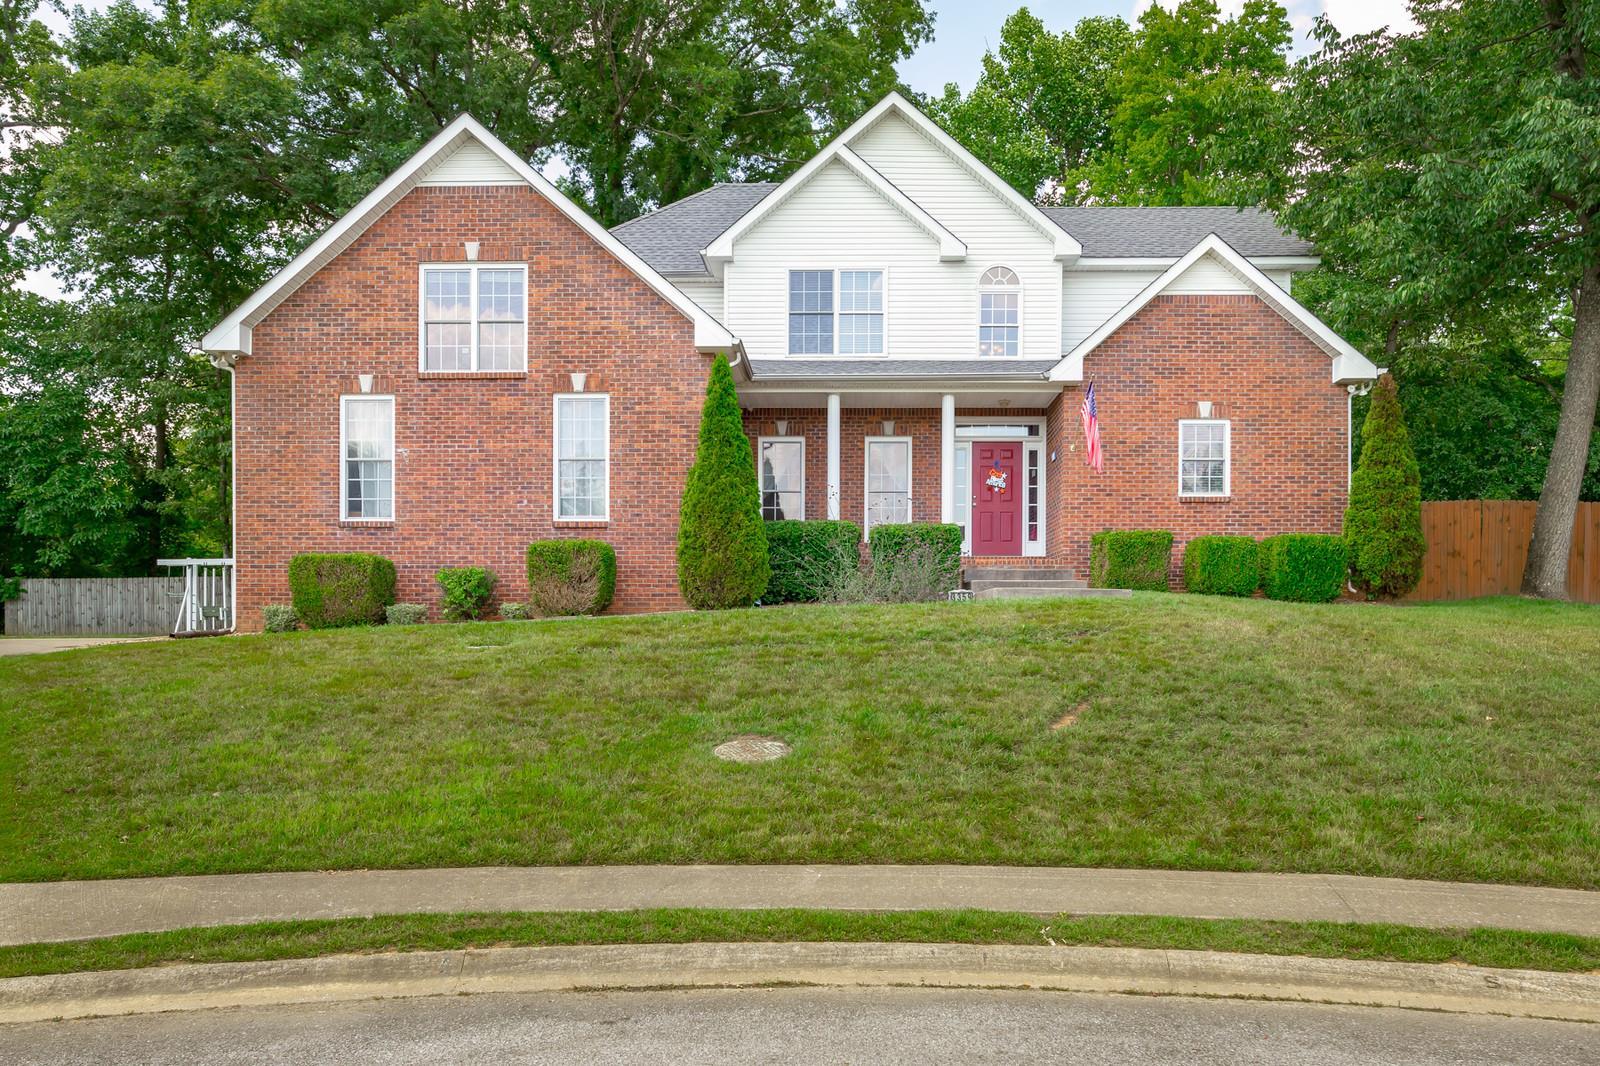 3359 Shetland Way, Clarksville, TN 37043 - Clarksville, TN real estate listing